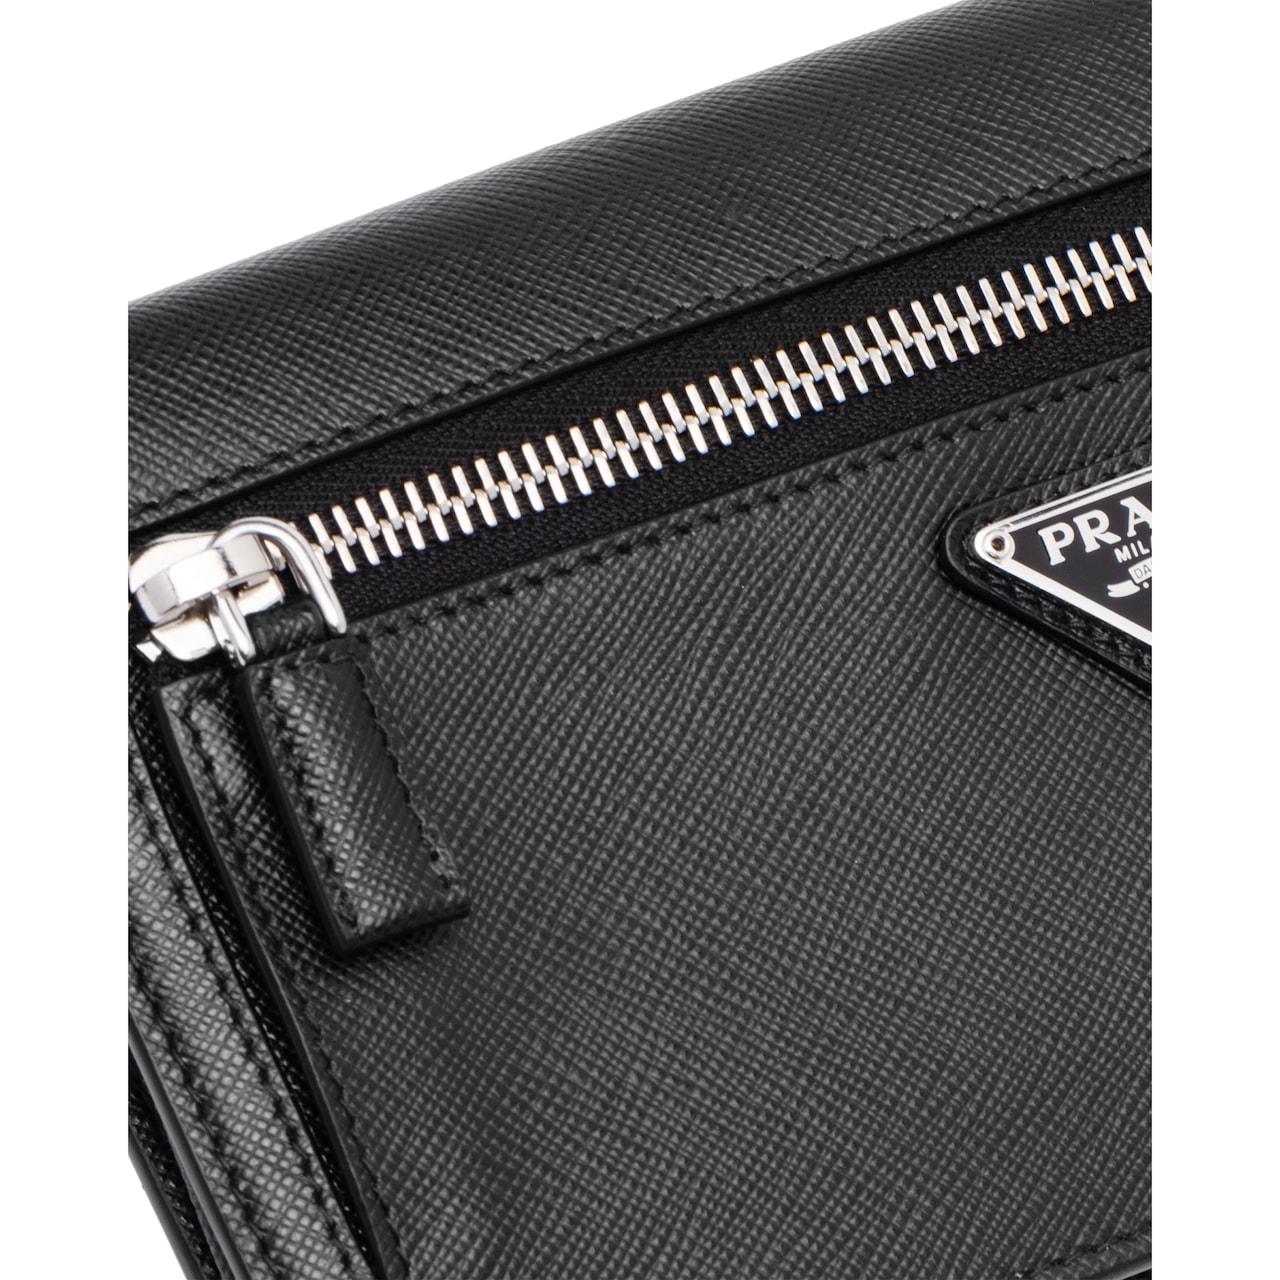 Prada Saffiano leather cellphone case 2